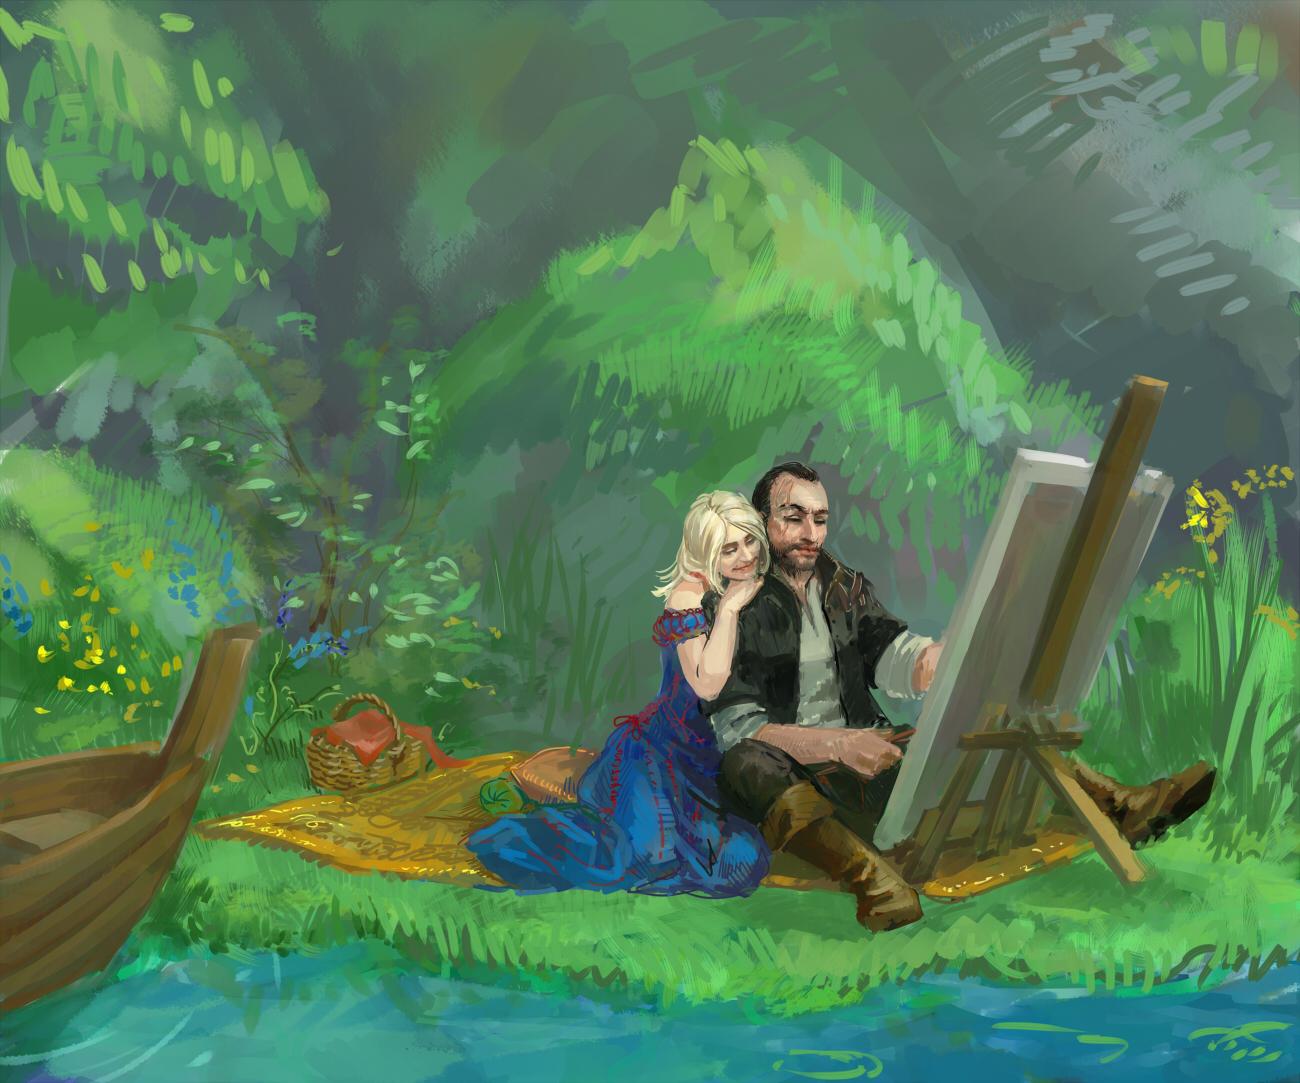 Милота - Witcher 3: Wild Hunt, the